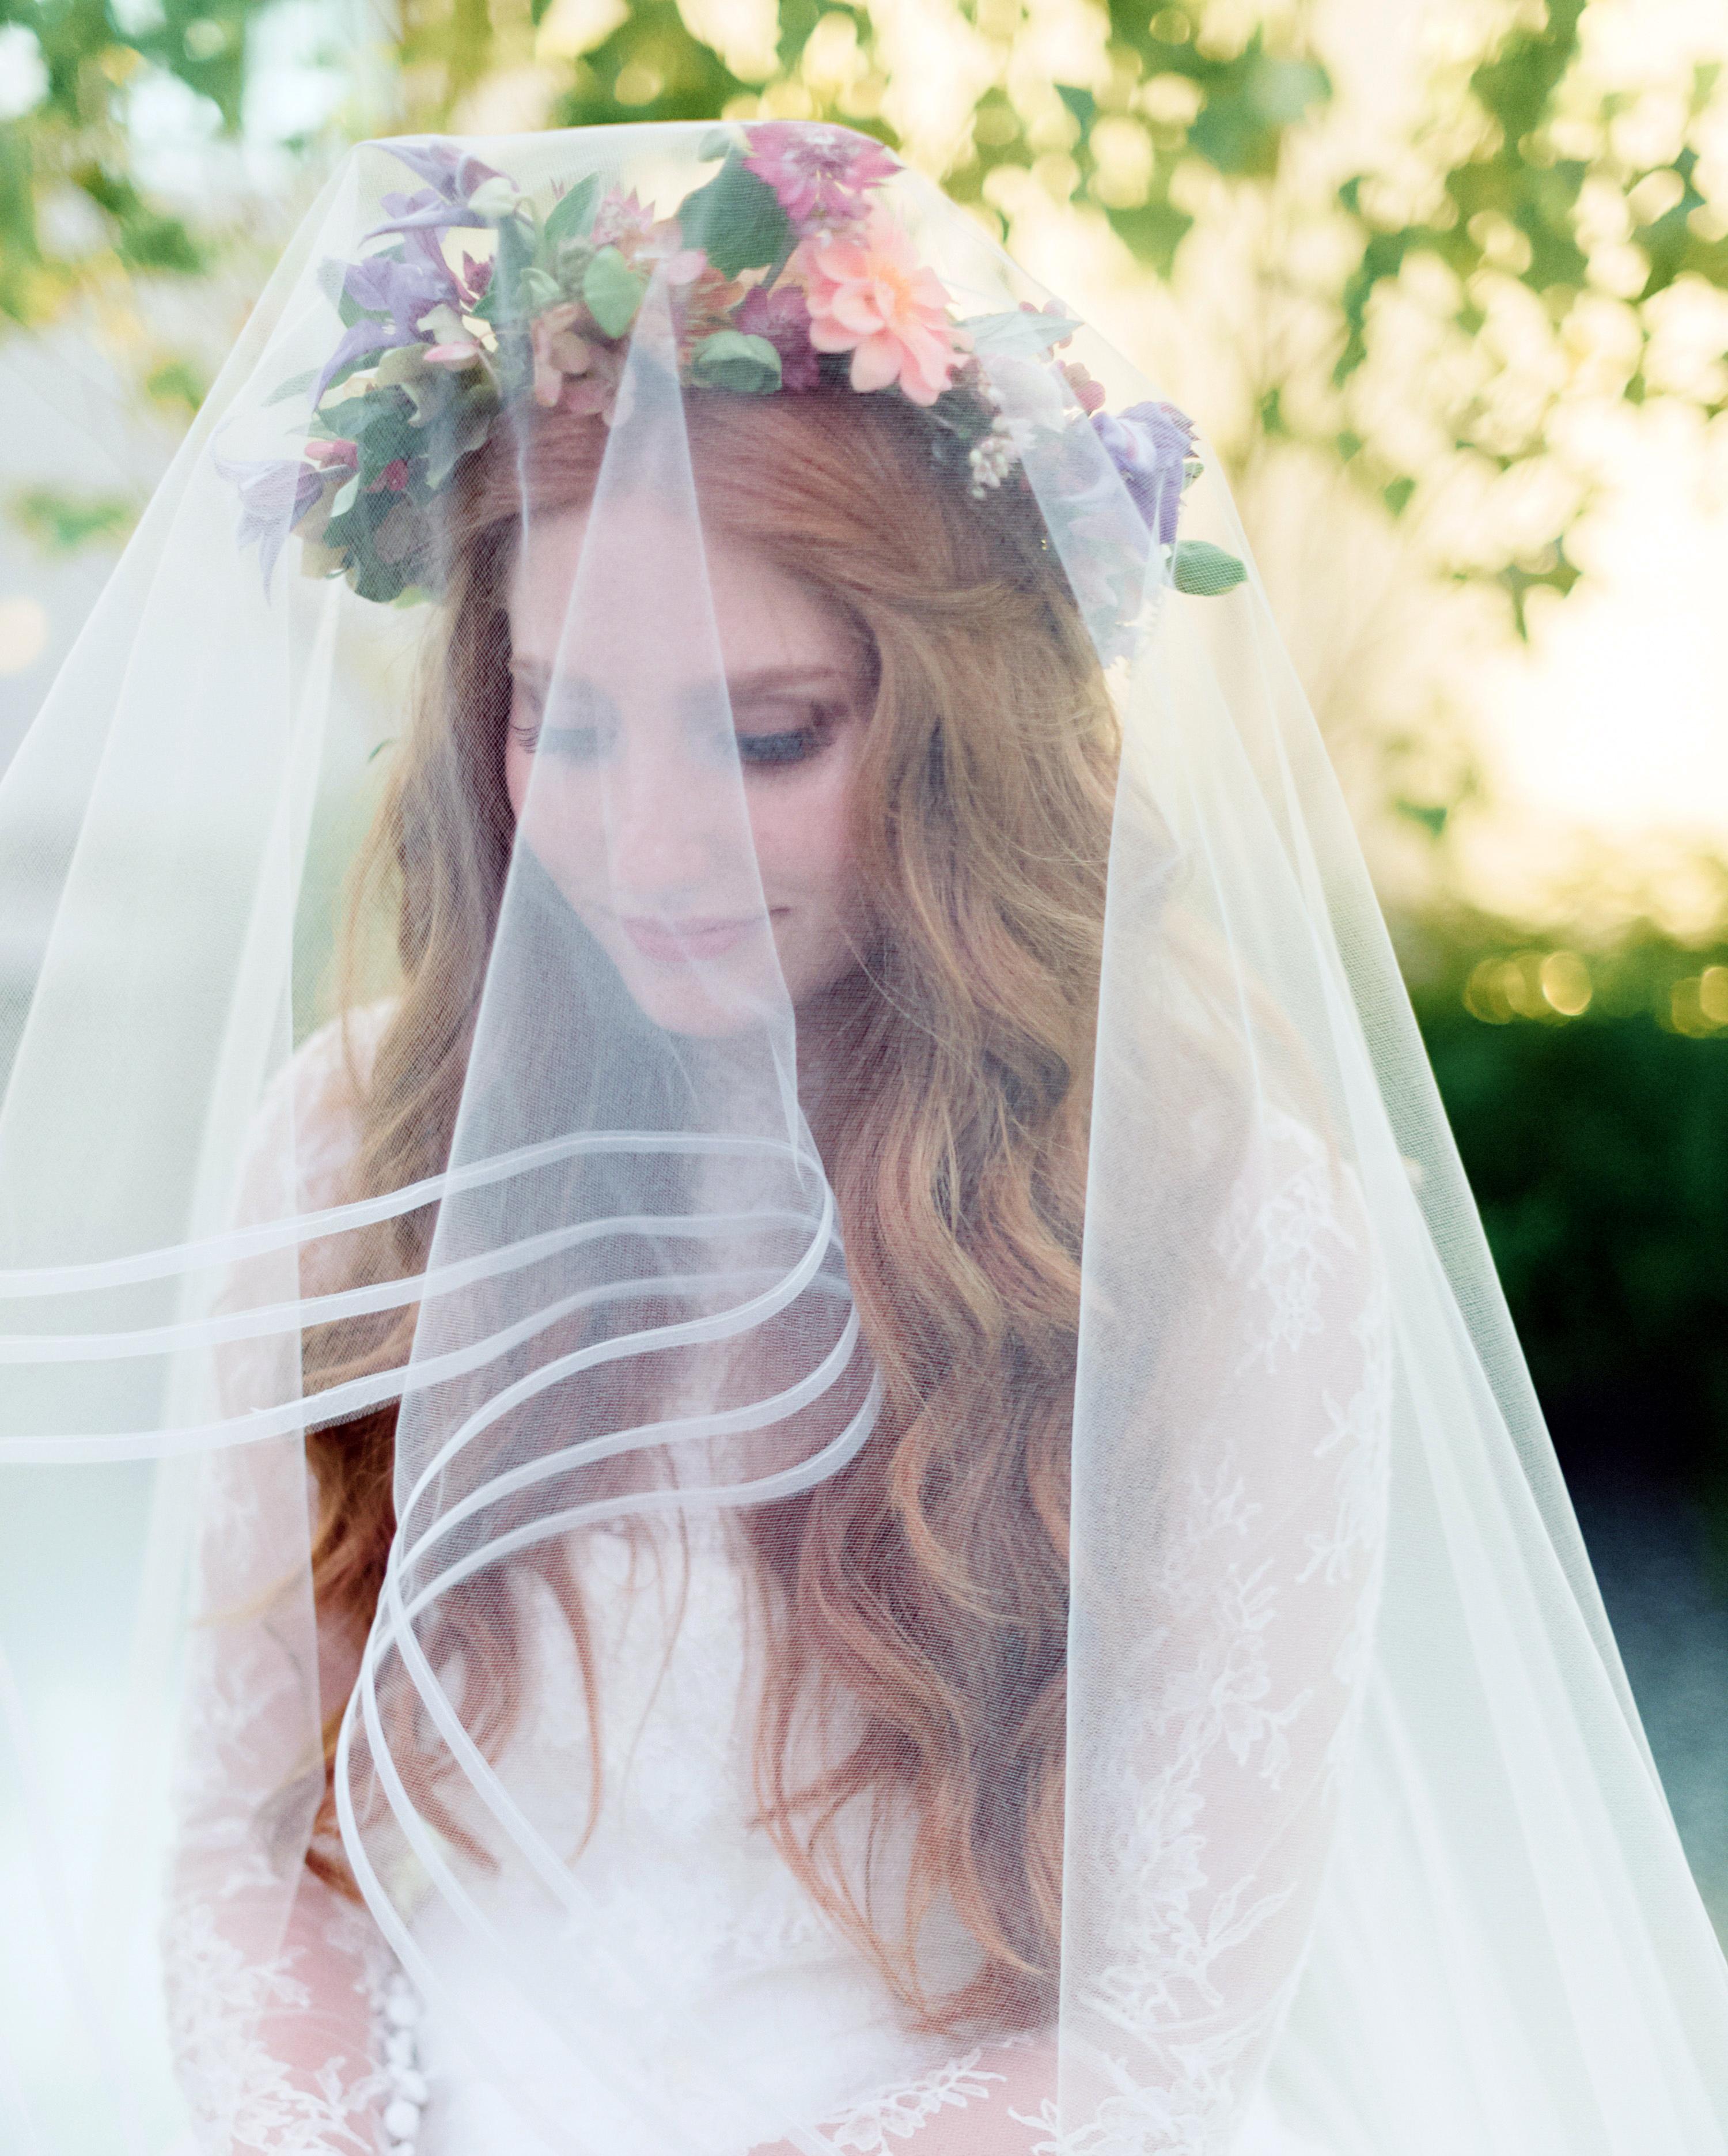 lilly-sean-wedding-veil-00319-s112089-0815.jpg